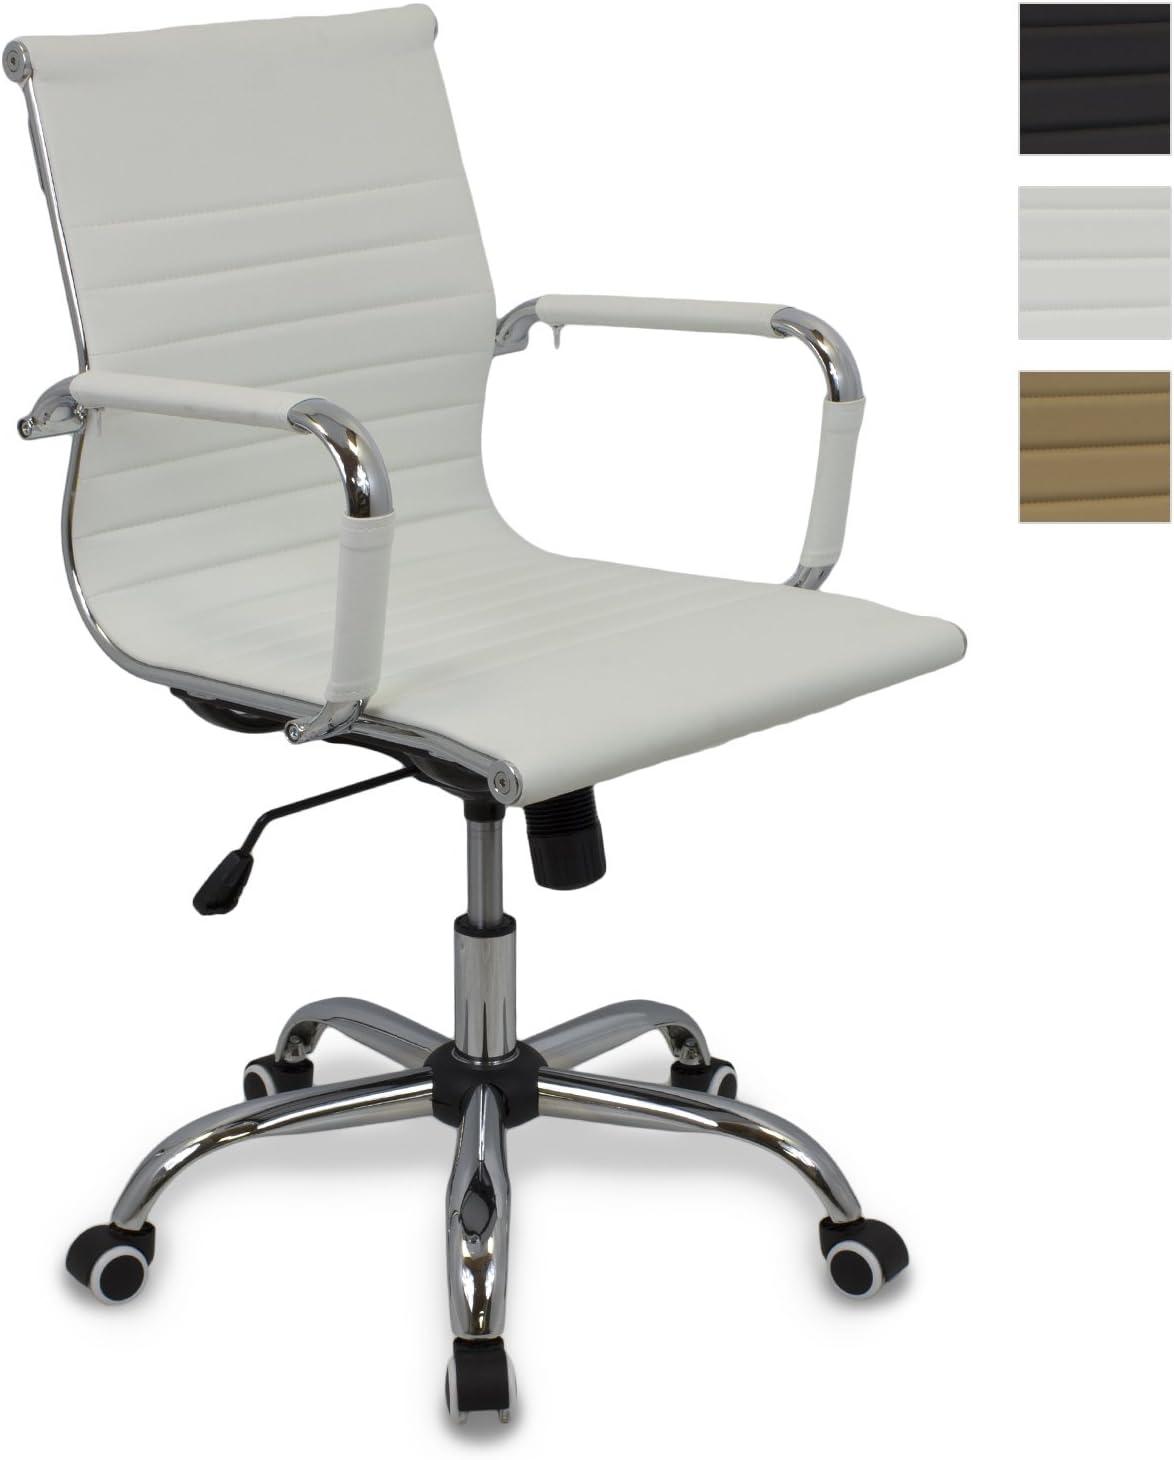 CashOffice - Silla de Escritorio Ajustable en altura, Silla de Oficina Giratoria con apoyabrazos de Piel Sintética (Varios Colores) (Blanco)